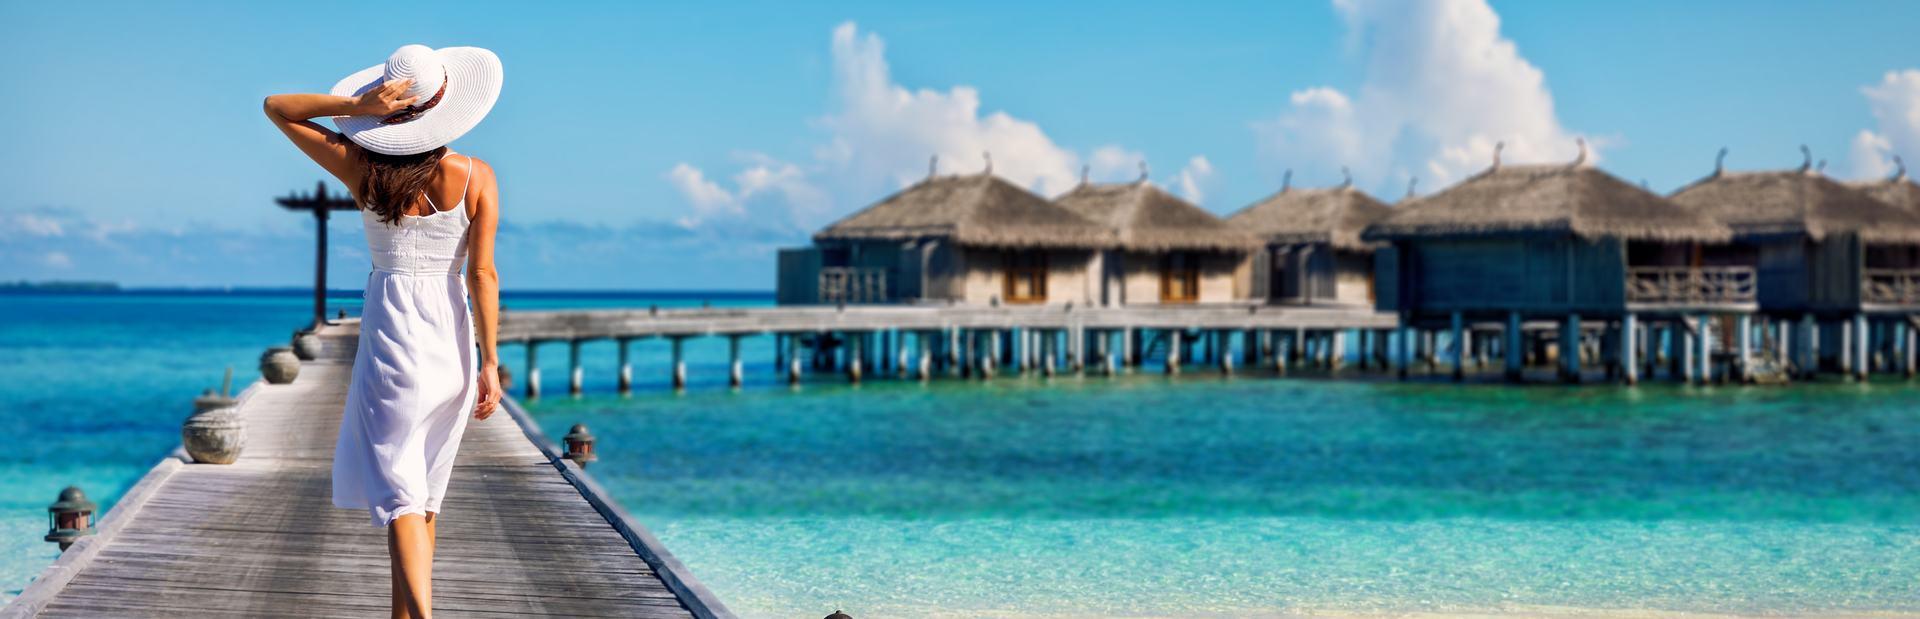 Finolhu Resort Image 1